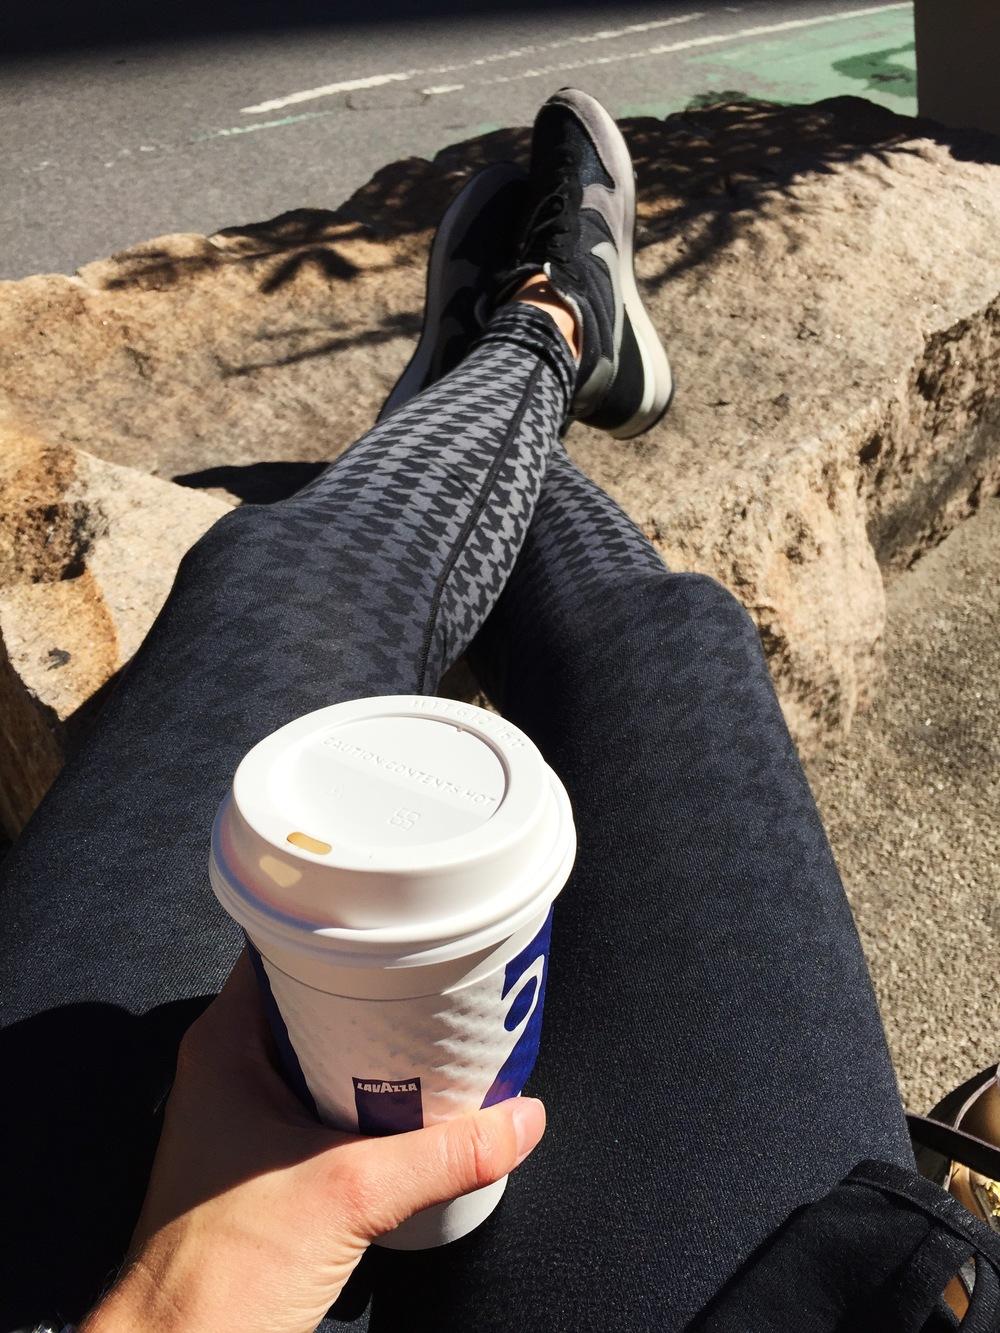 LaurenSchwaiger-Life-Style-Travel-Blog-Active-Style-Yoga-Leggings.jpg